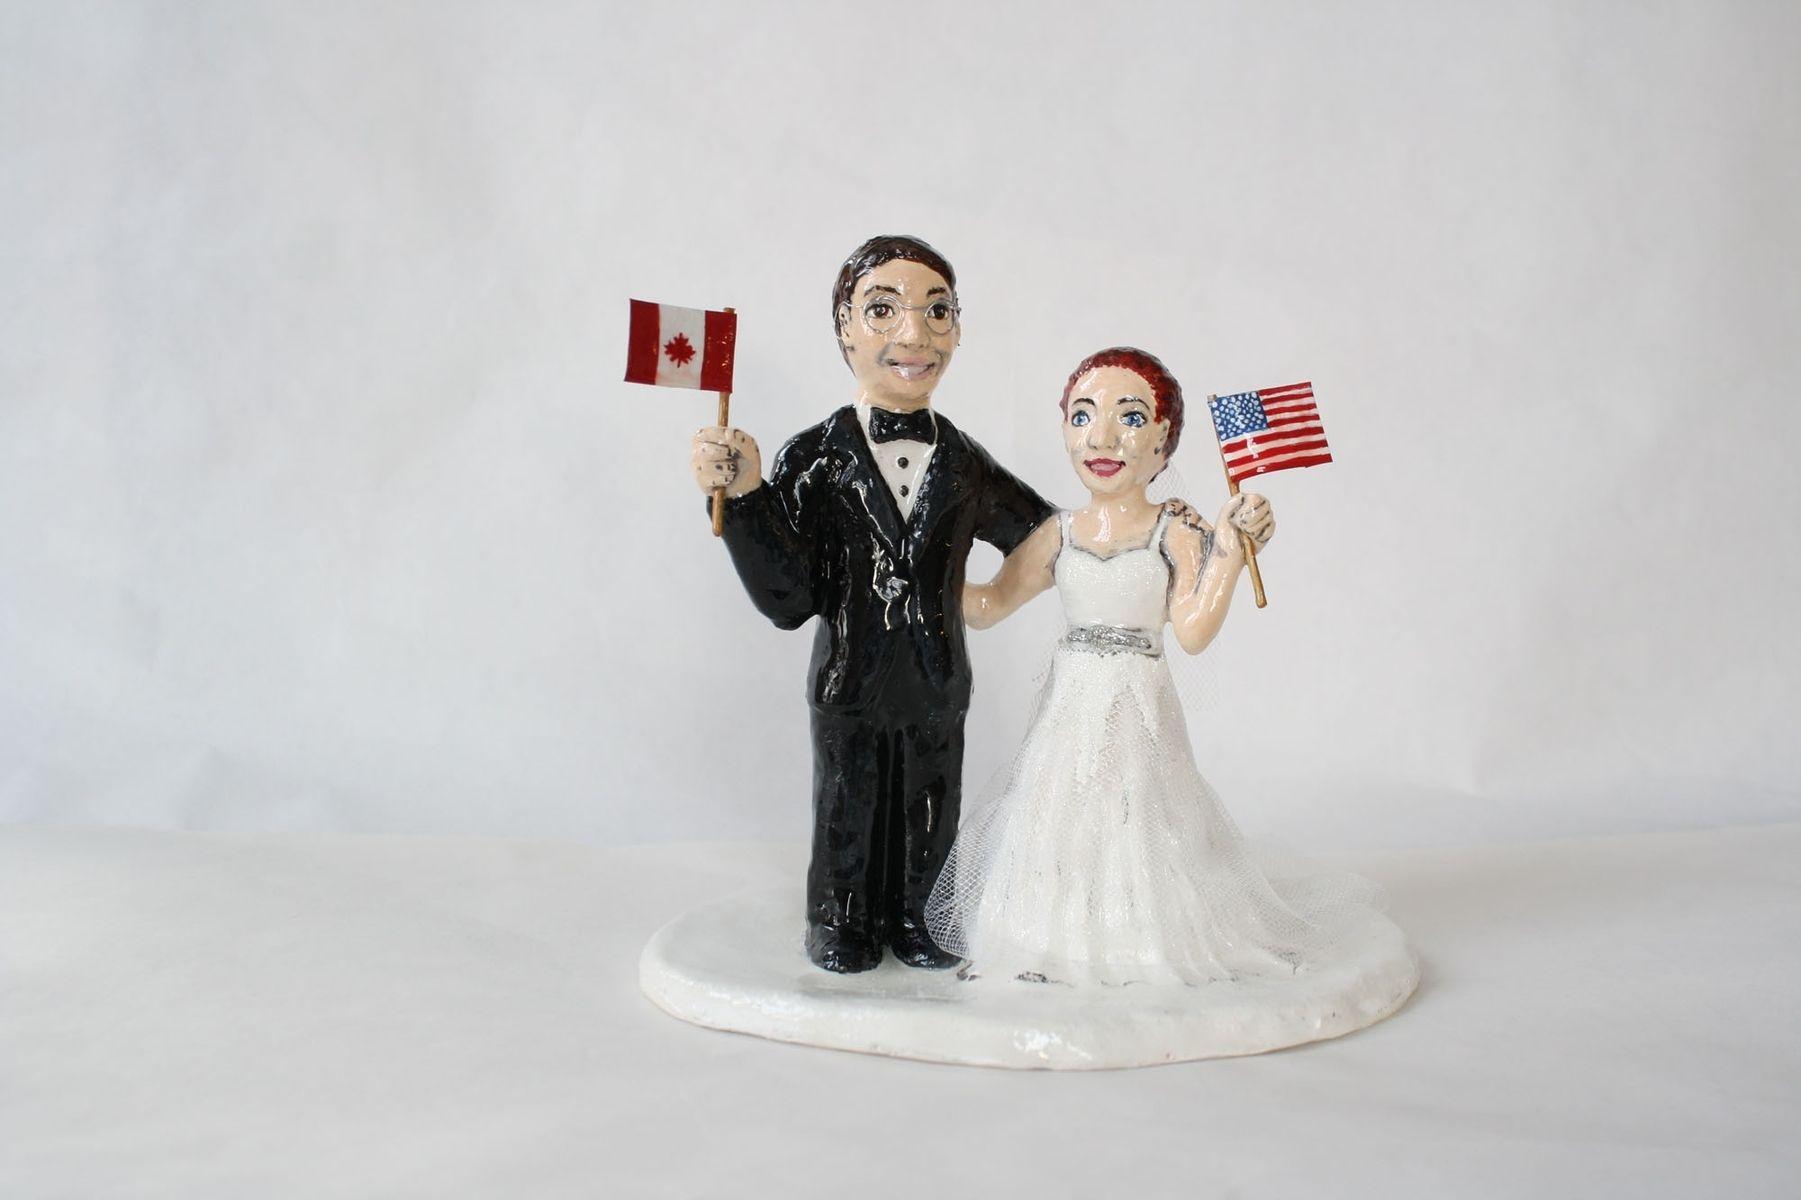 Custom International Couple Cake Topper By Sara E Lynch